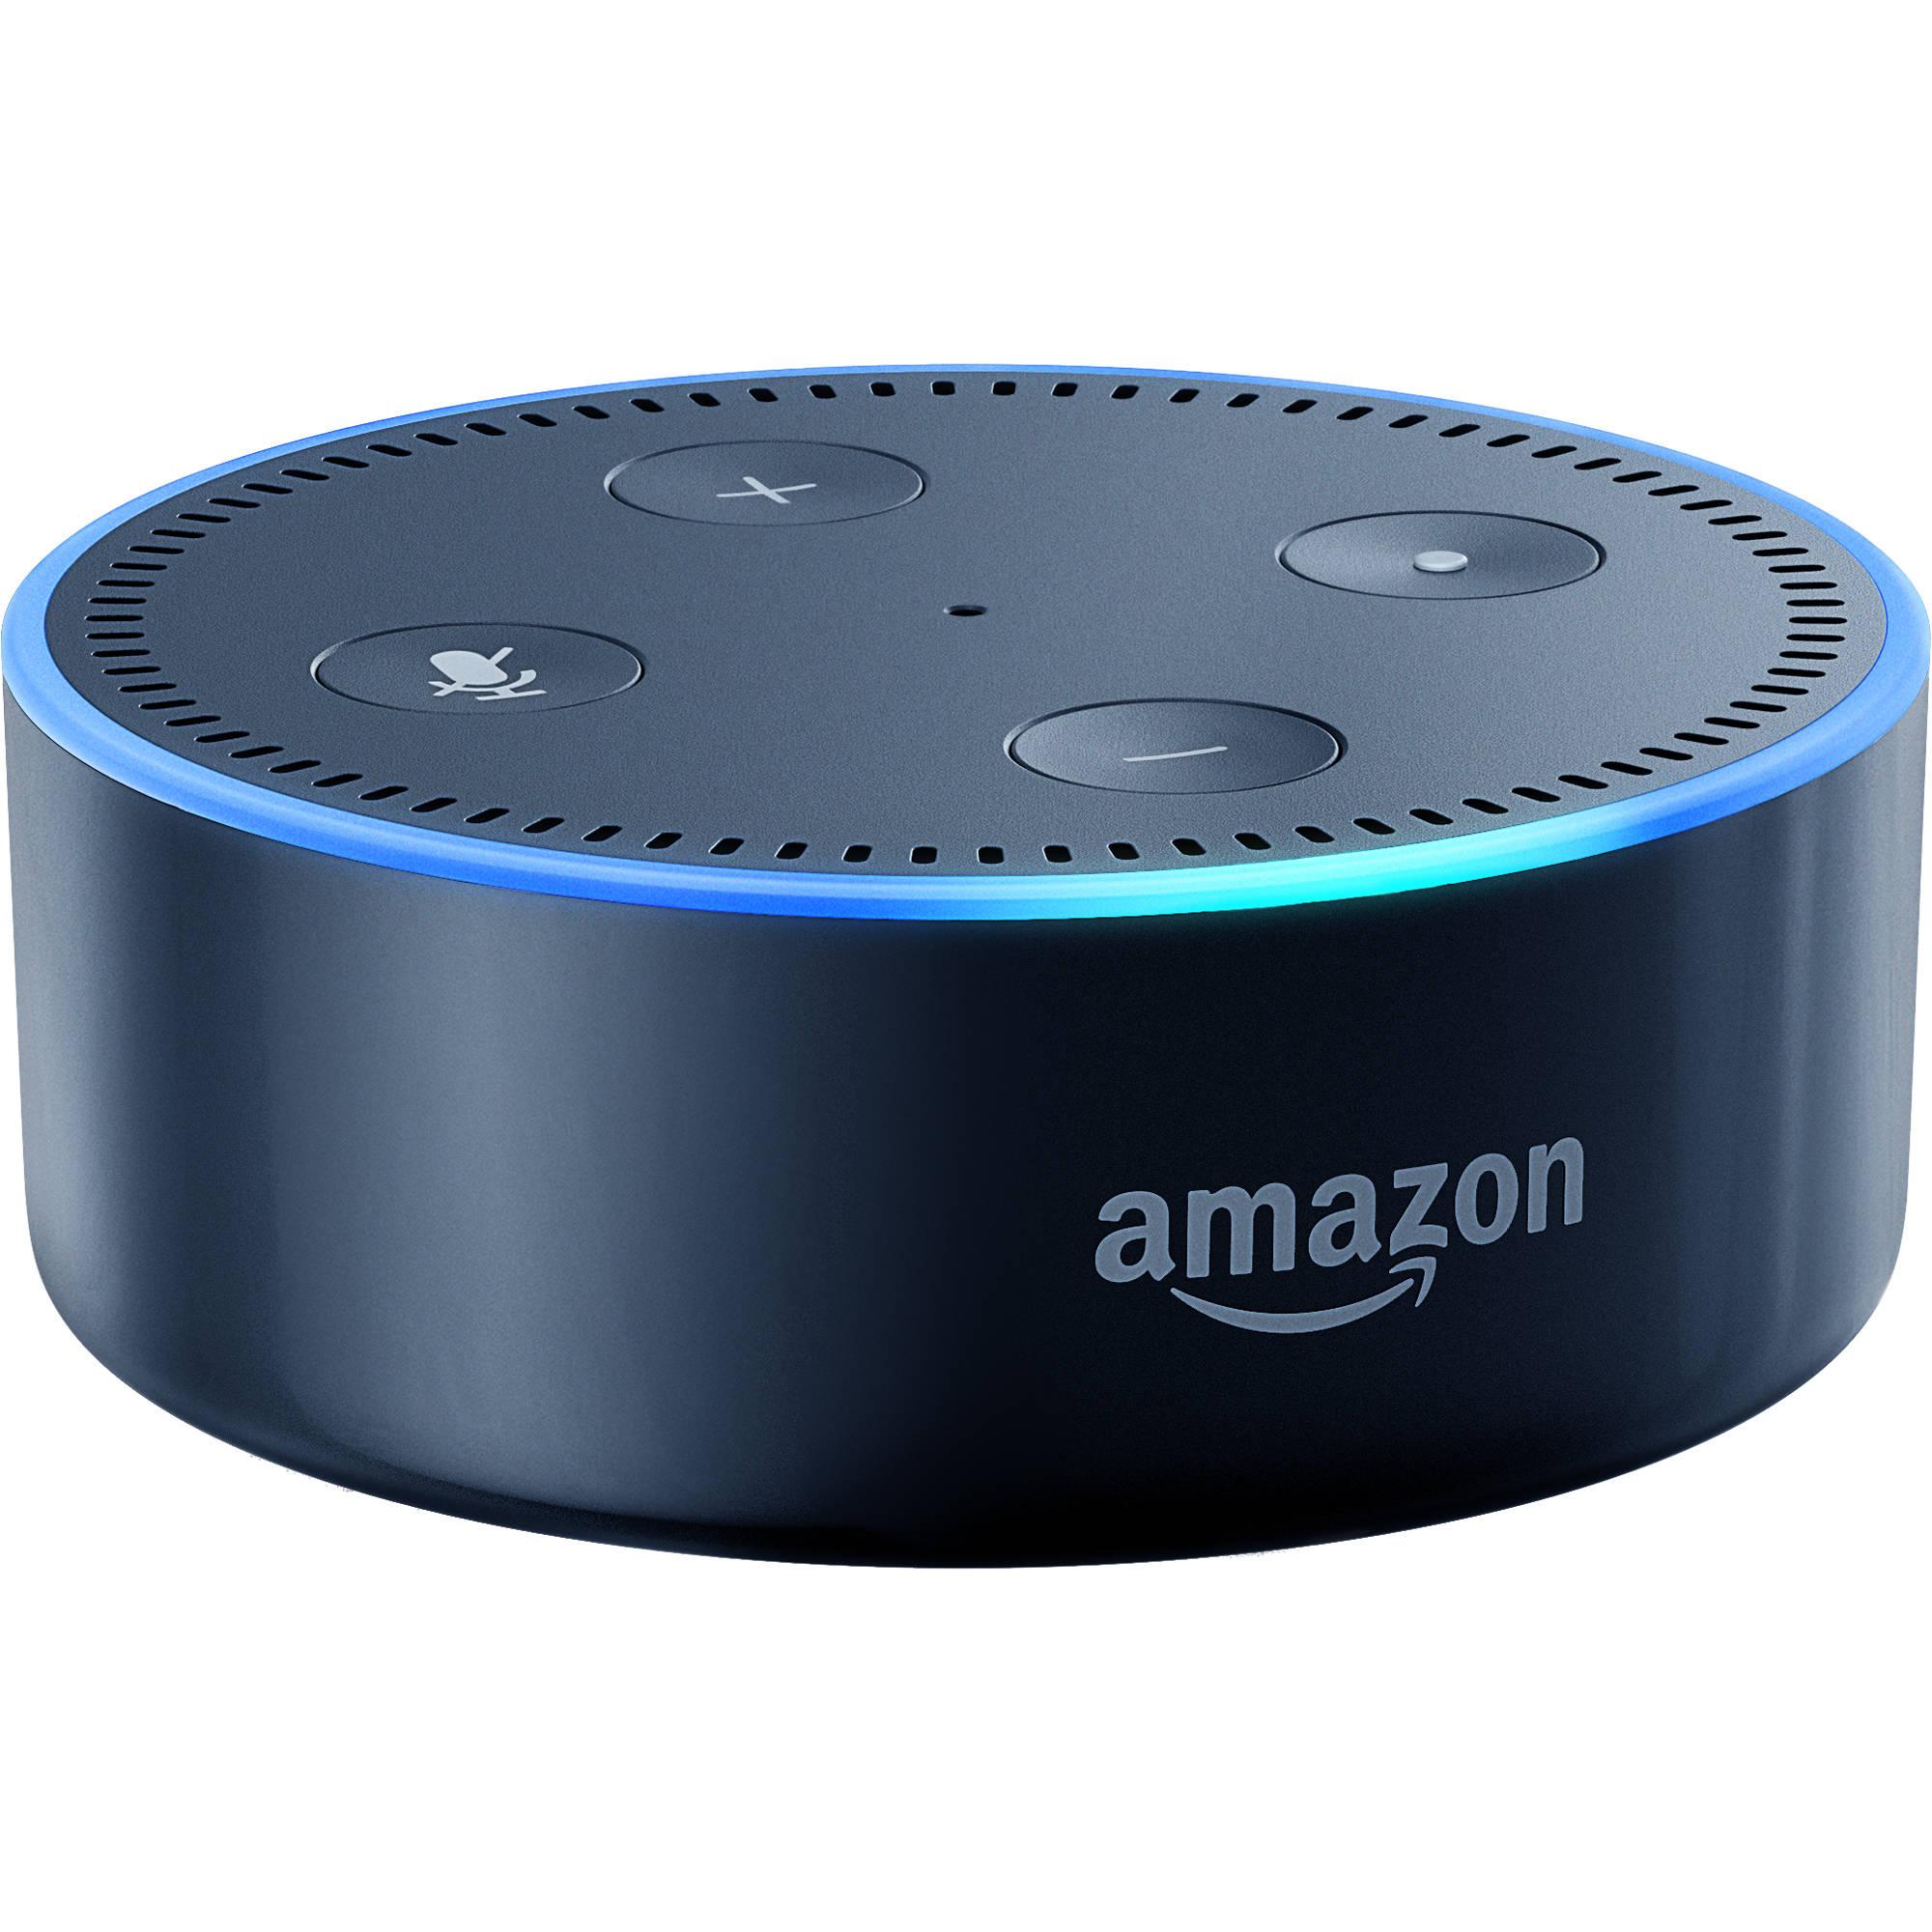 Amazon Echo Dot Gen2 - Smart Home Assistant feat. Alexa - Black